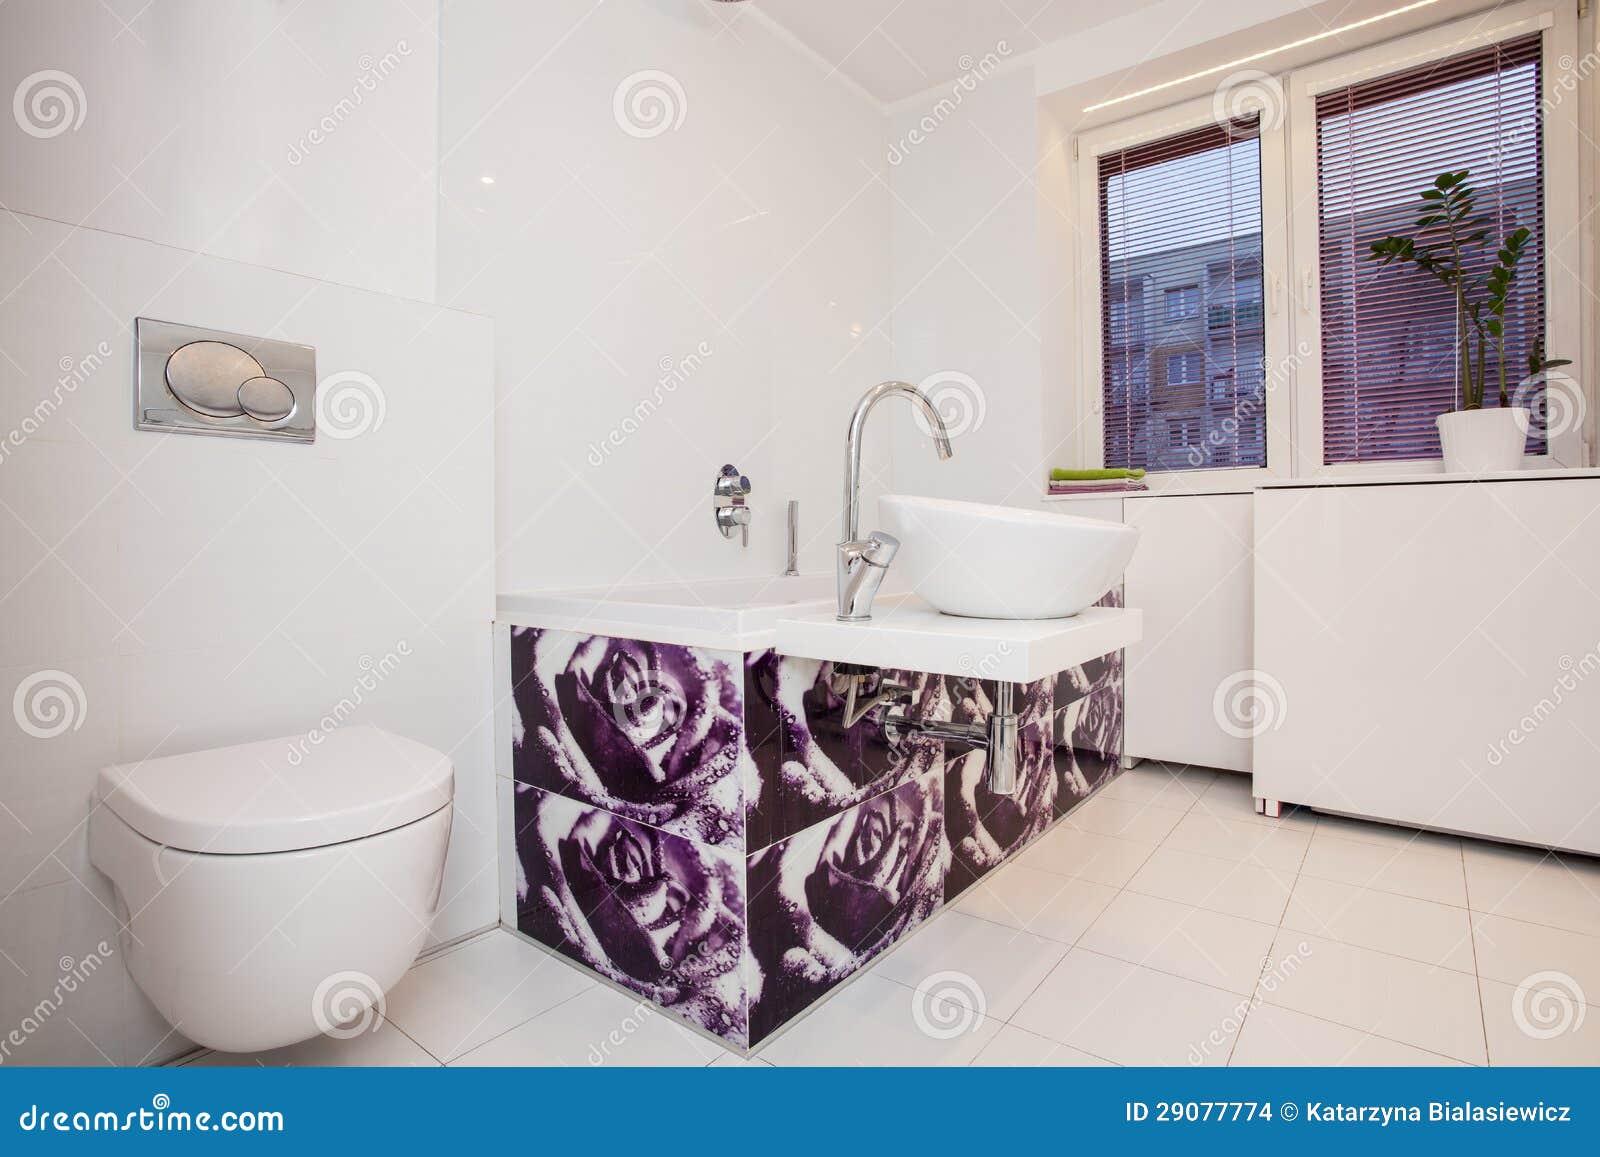 Plano elegante cuarto de ba o moderno imagenes de - Cuarto bano moderno ...